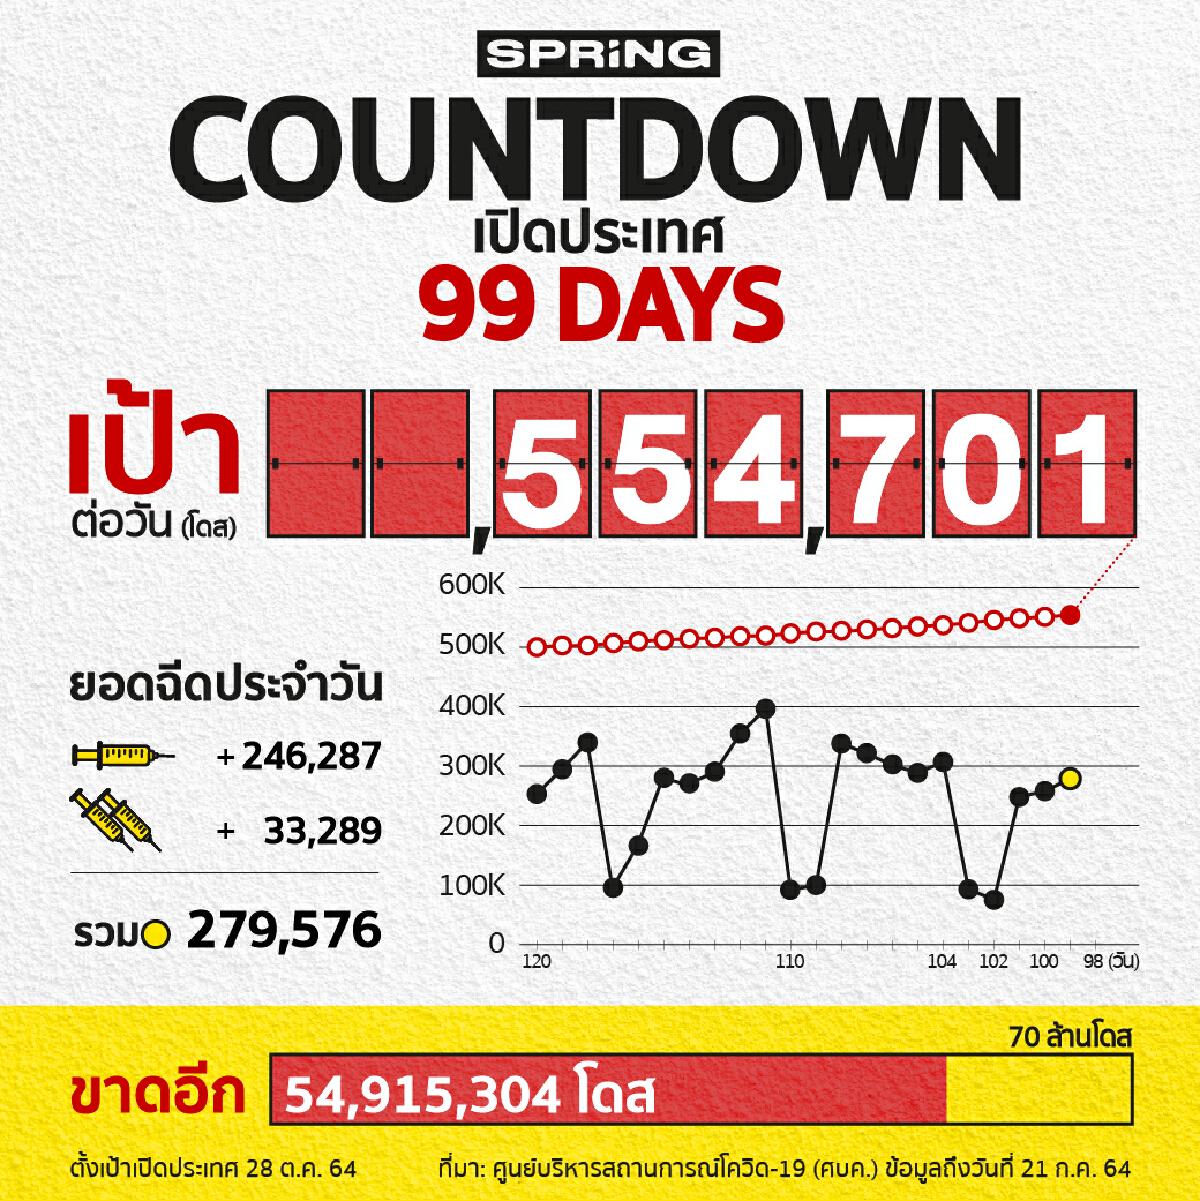 COUNTDOWN! เปิดประเทศใน 99 วัน ฉีดวัคซีนโควิด 279,576 โดส